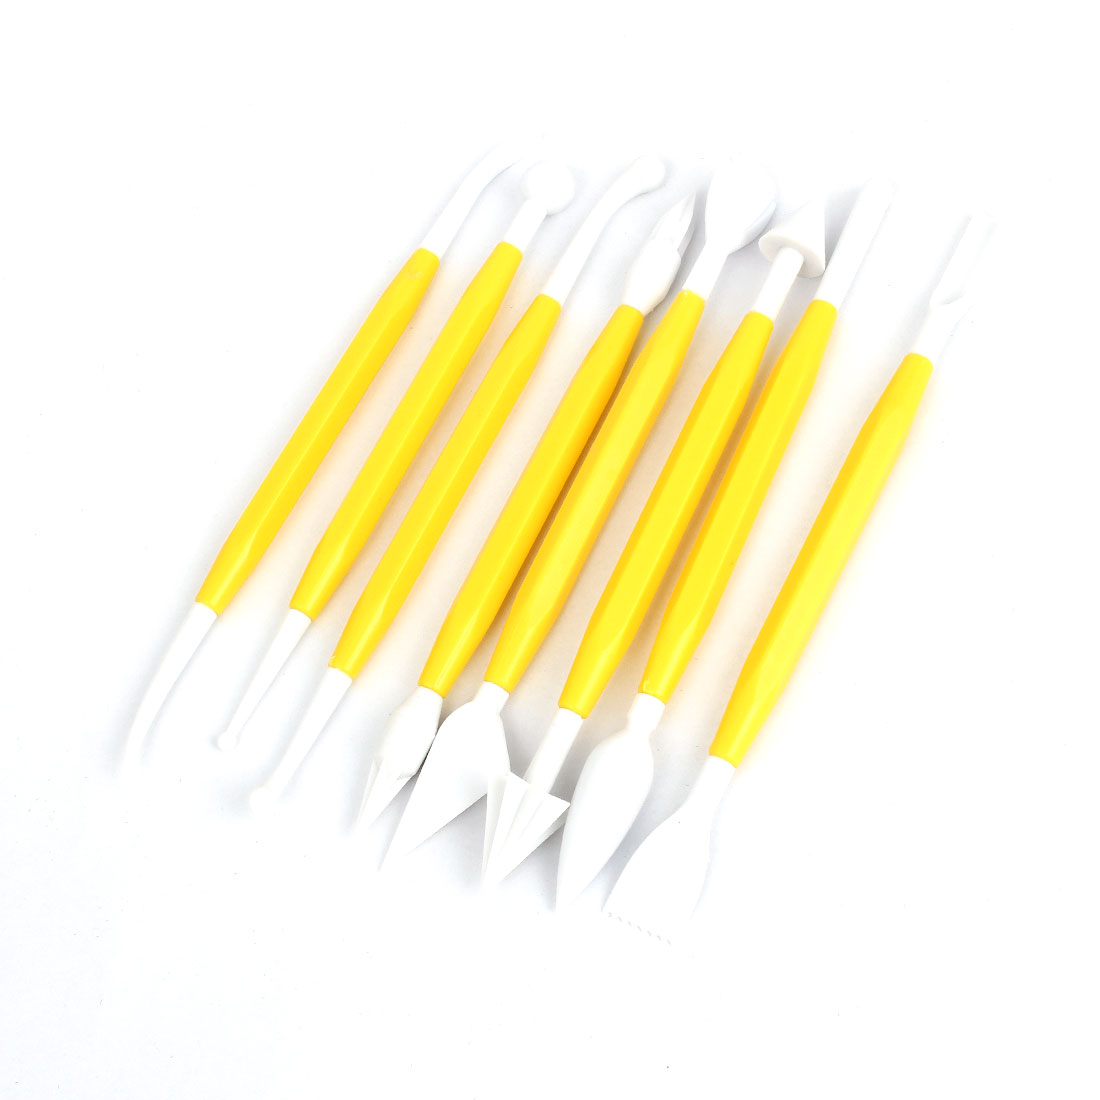 8 in 1 Flower Sugarcraft Fondant Cake Decorating Modelling Tools Yellow White